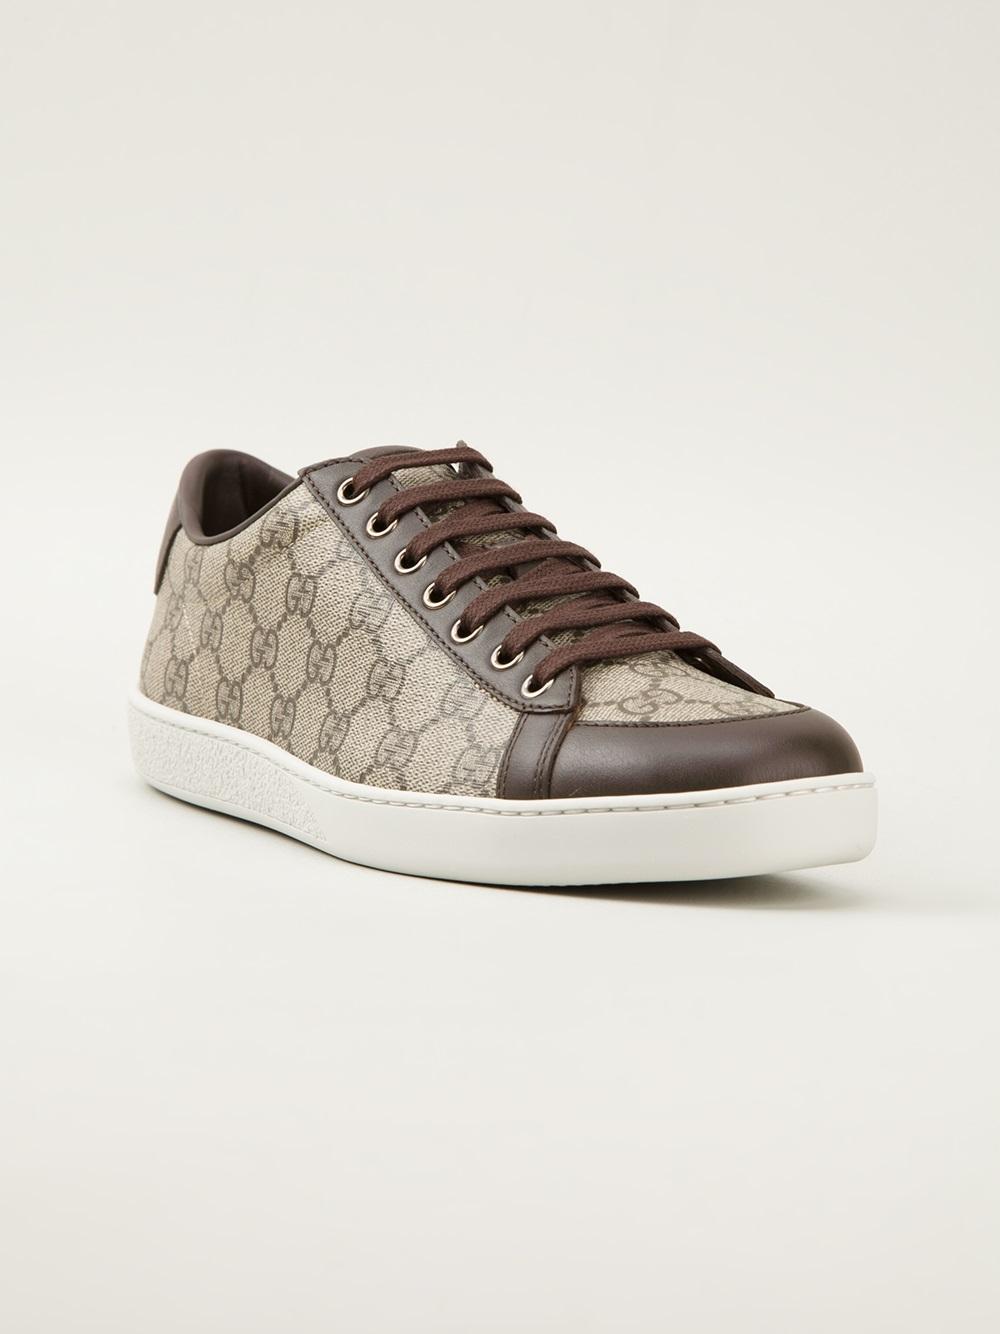 e78f30325 Gucci Monogram Sneakers in Brown - Lyst